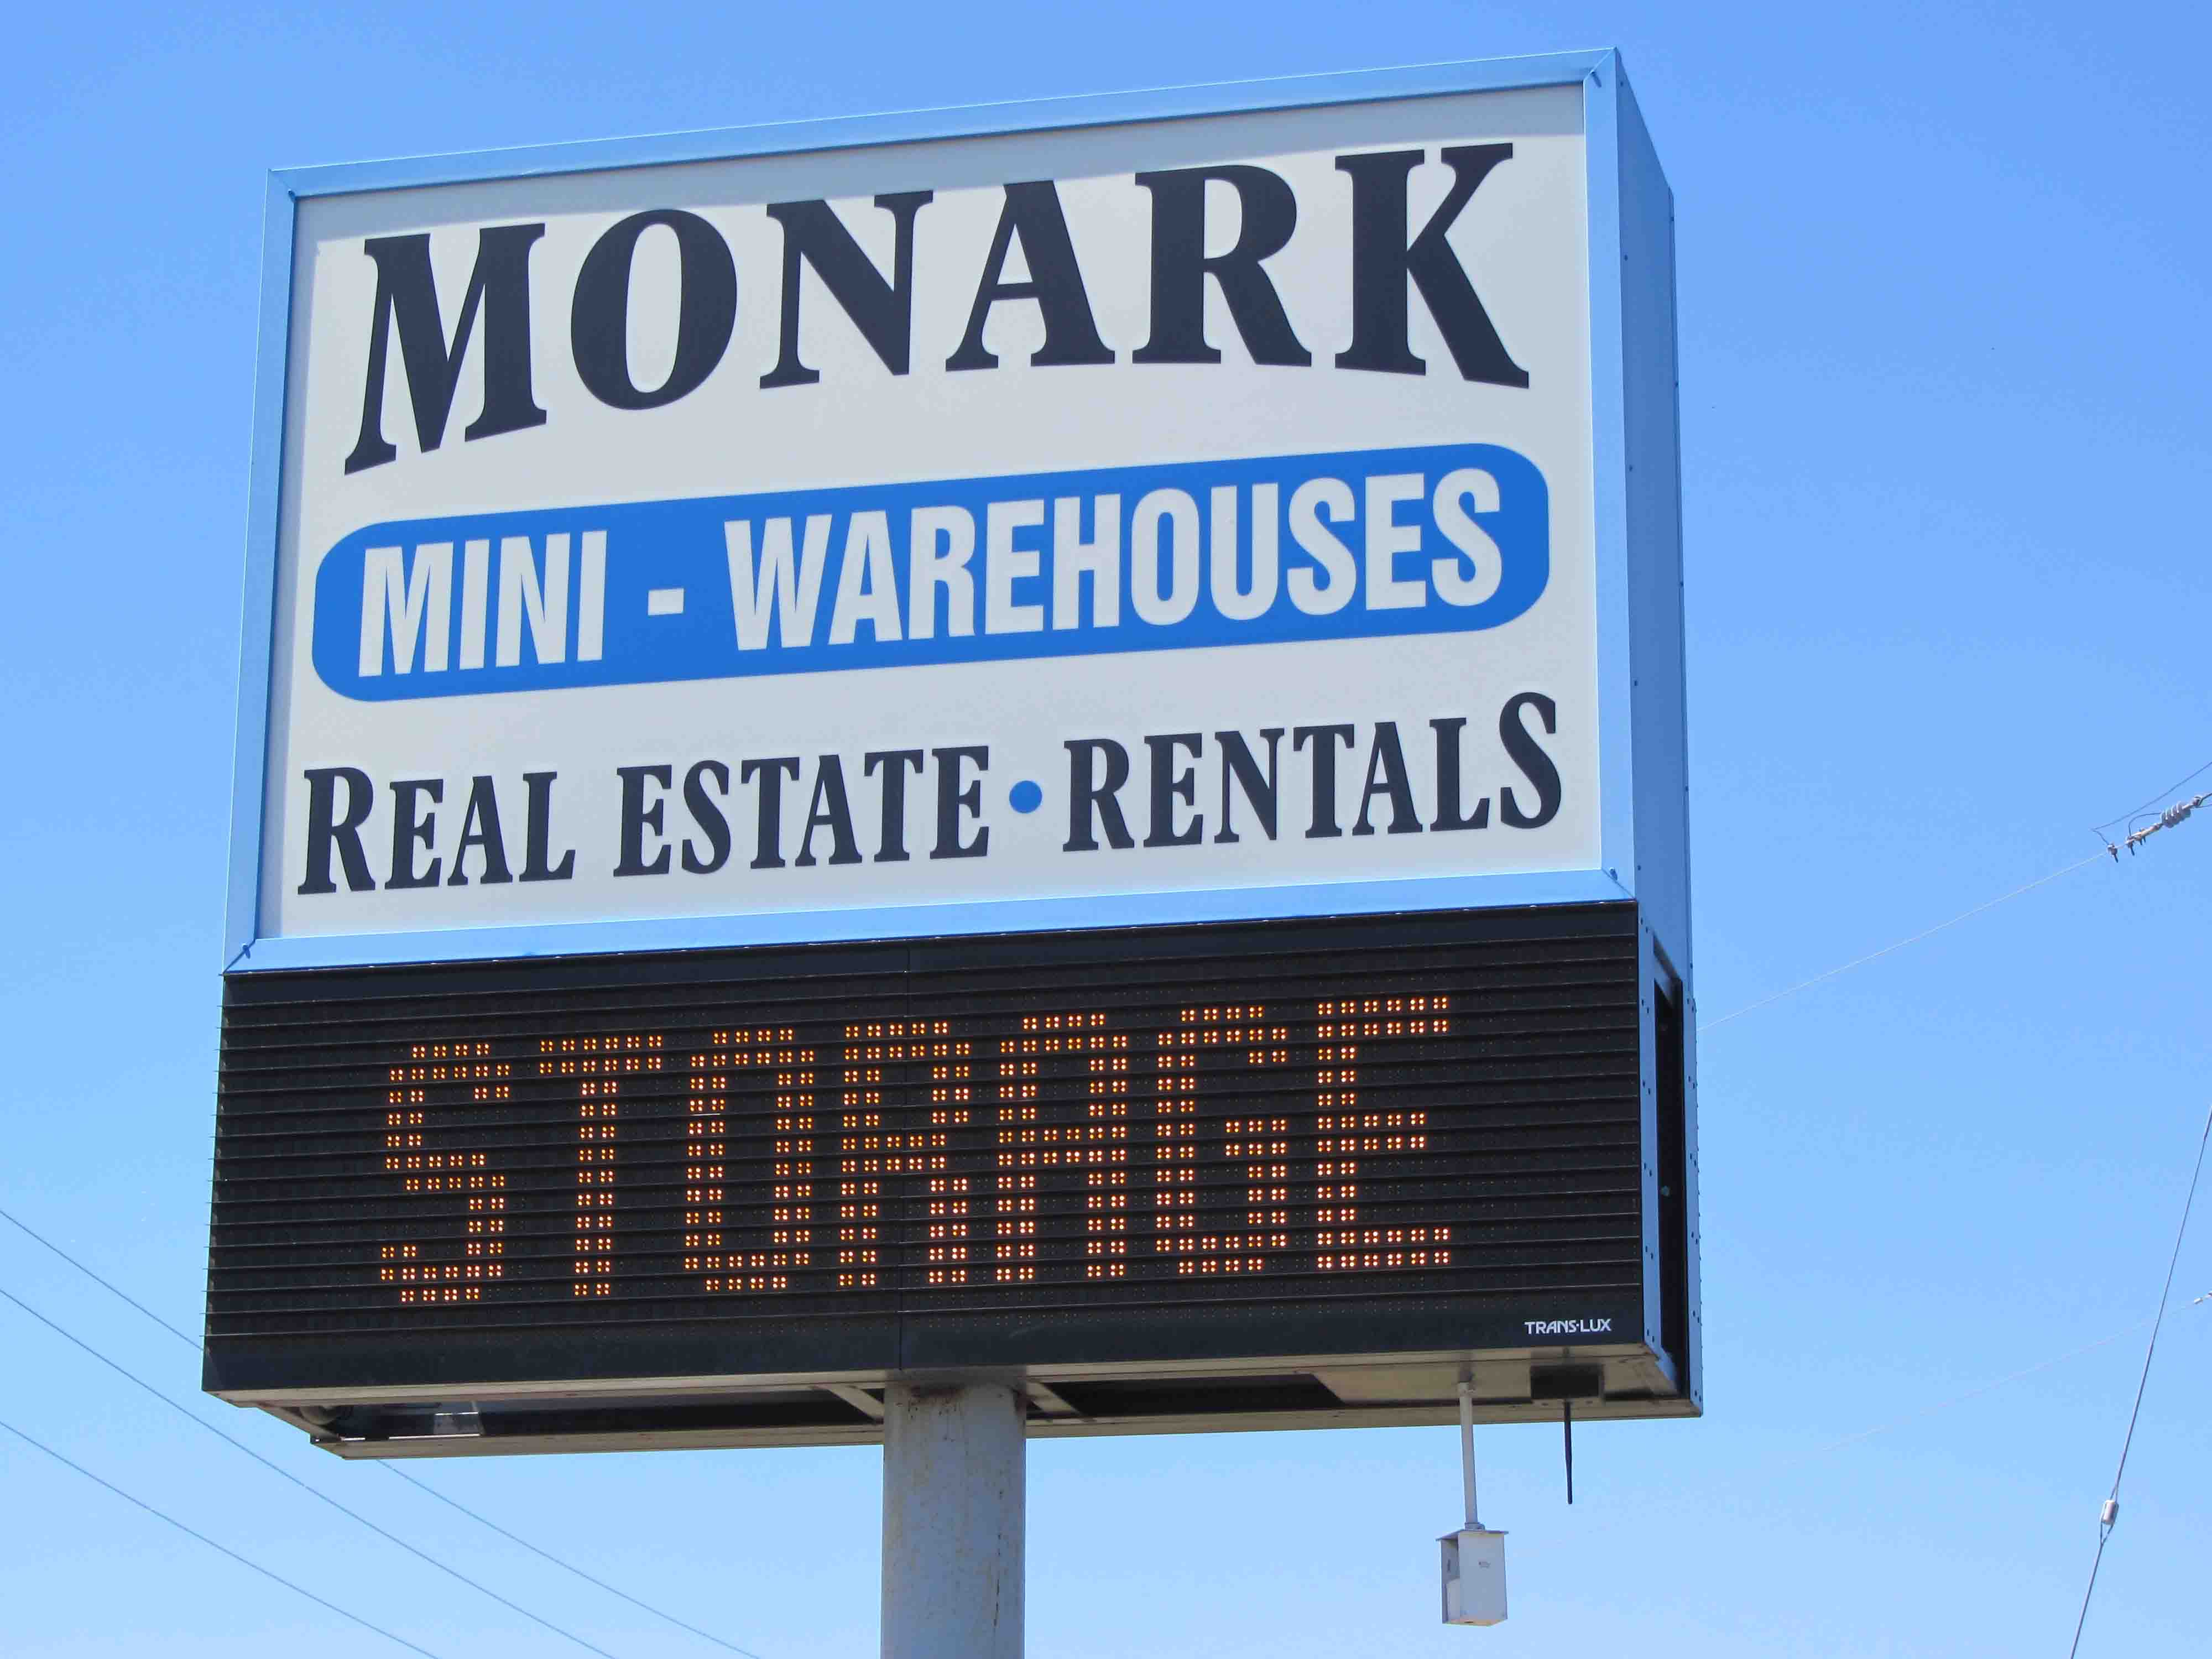 Monark Mini-Warehouses sign